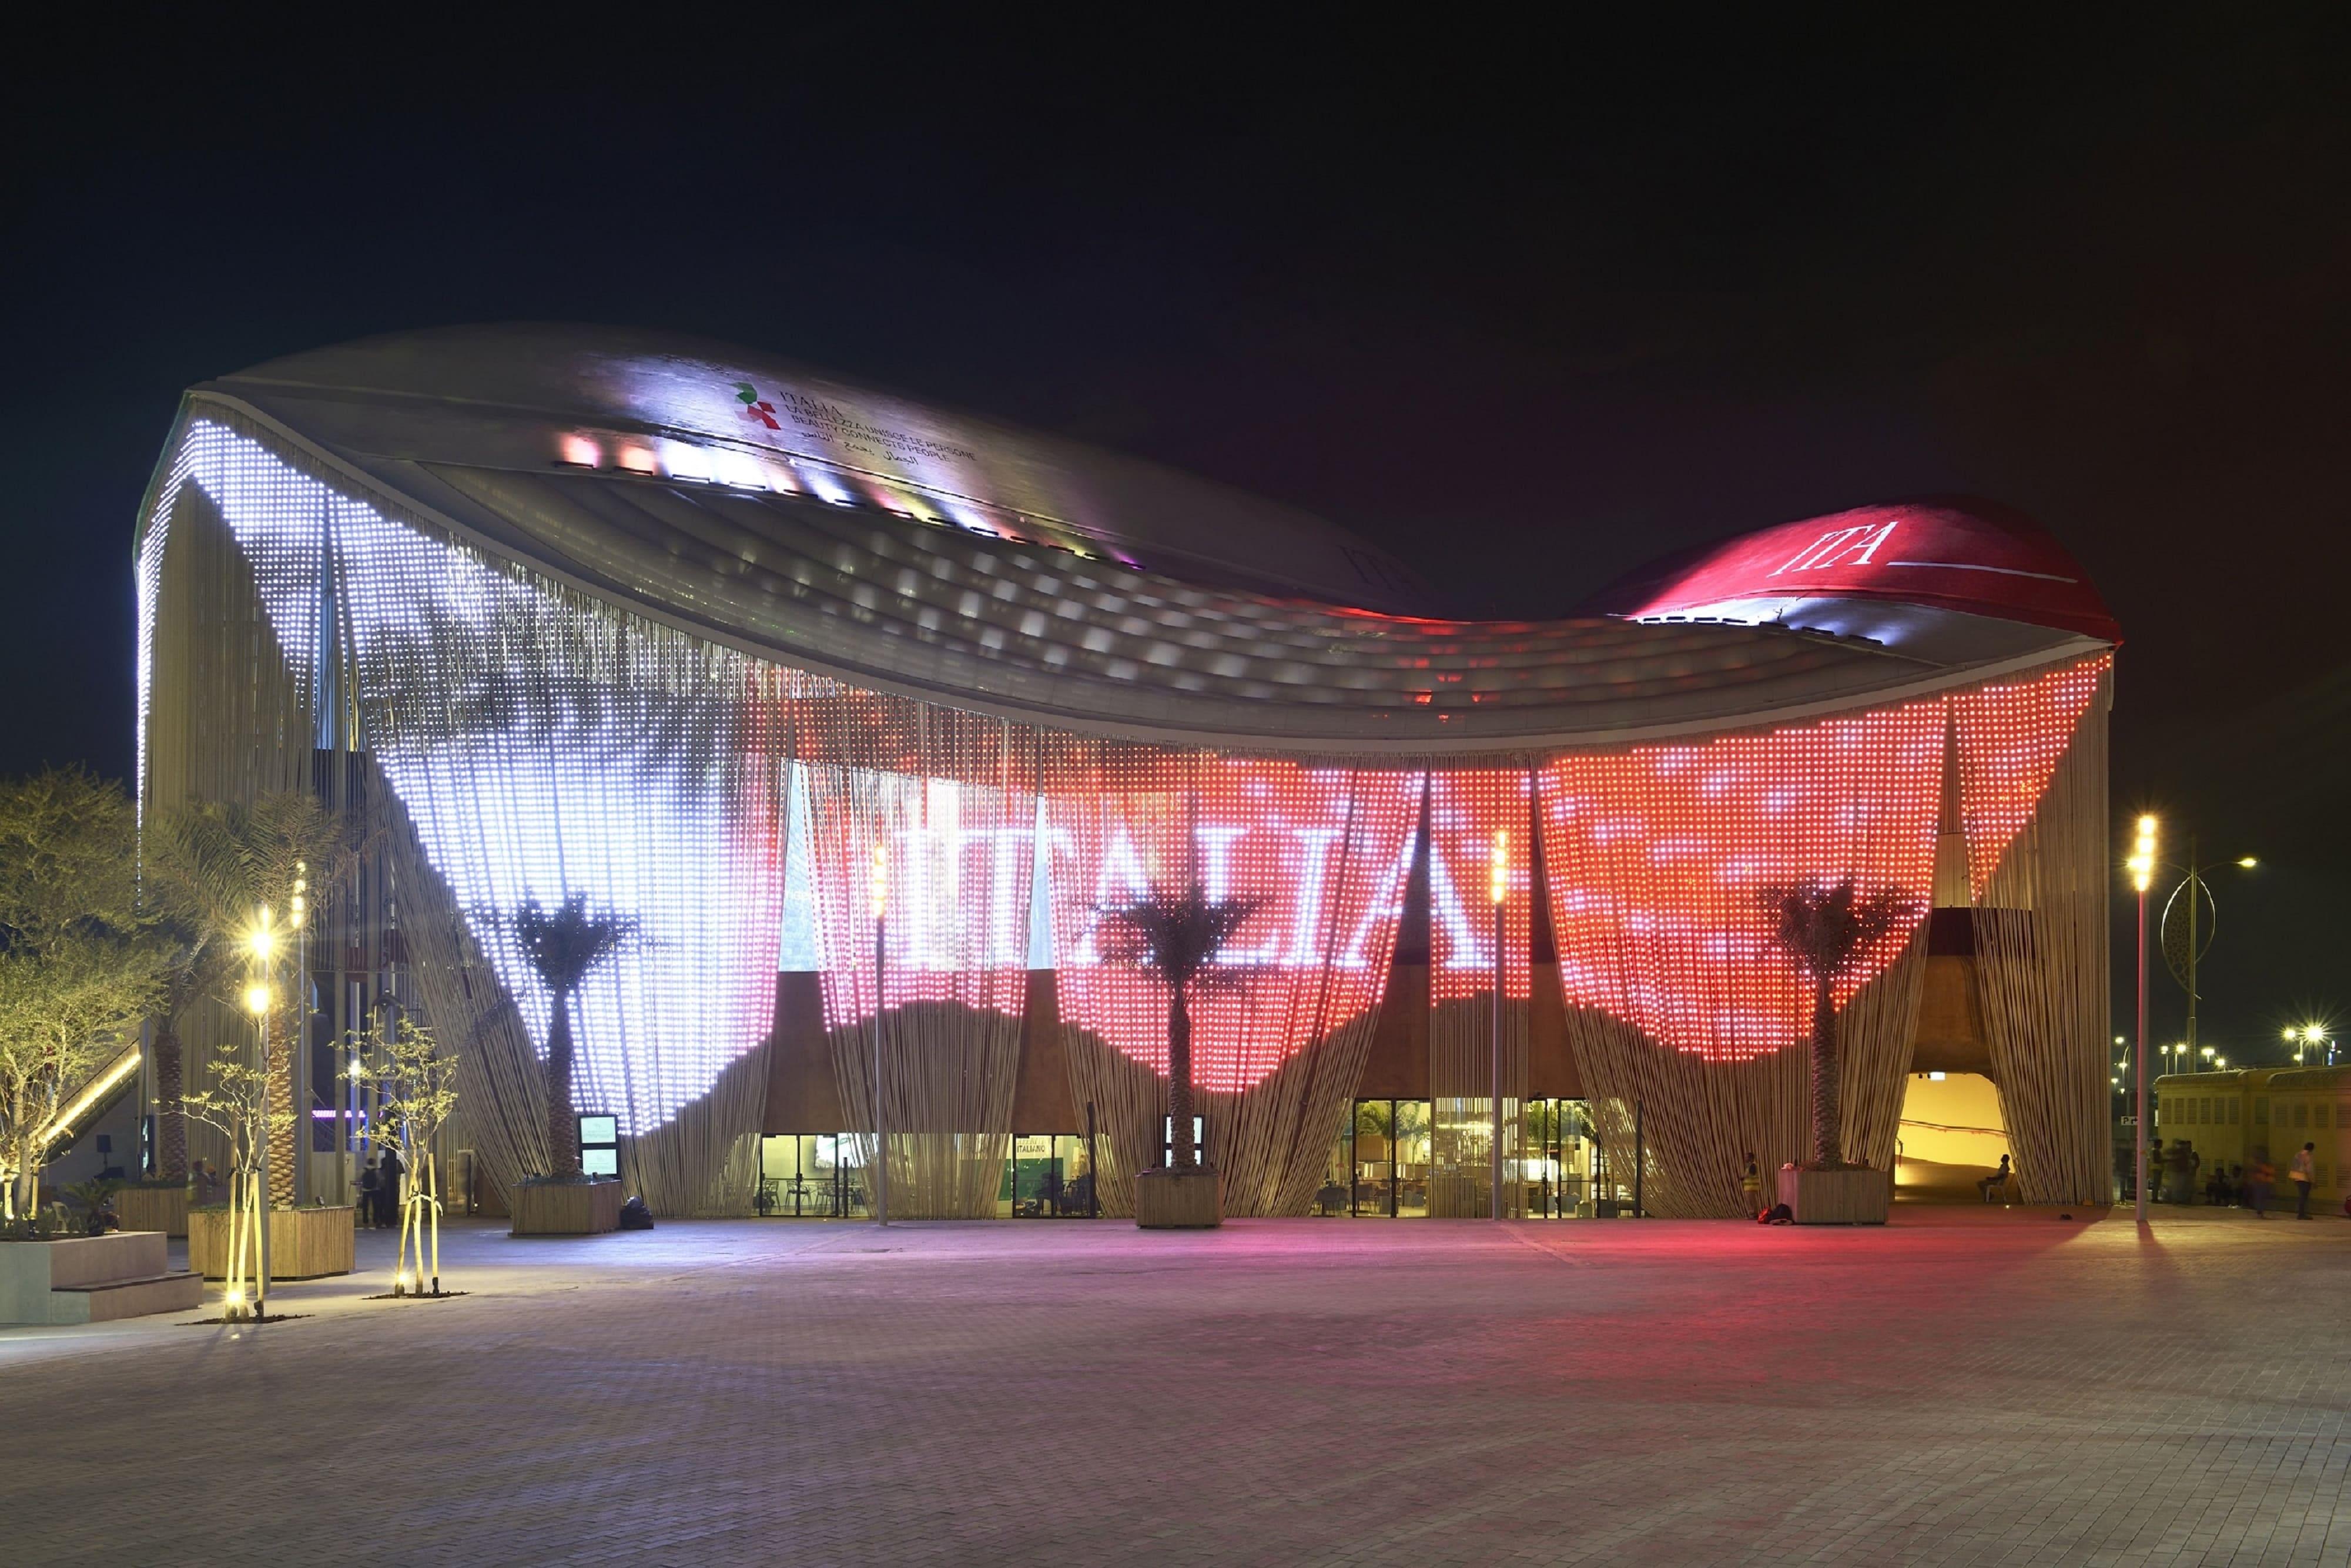 Padiglione Italia - Expo Dubai 2020 - credits Michele Nastasi